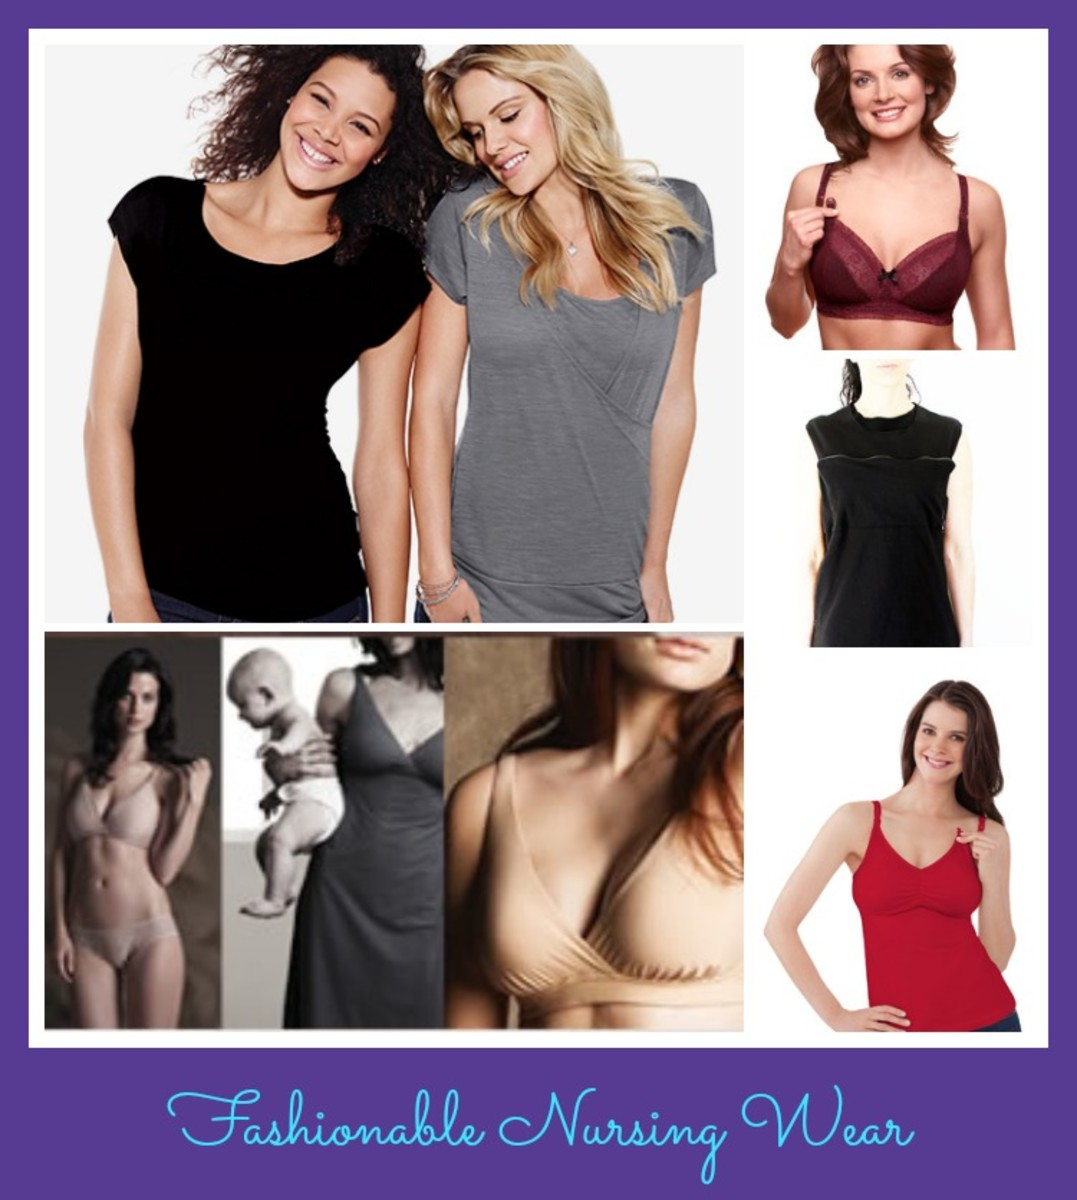 nursing fashion, thyme maternity, bella materna, bravado designs, louis valcourt, breastfeeding fashions, breastfeeding lingerie